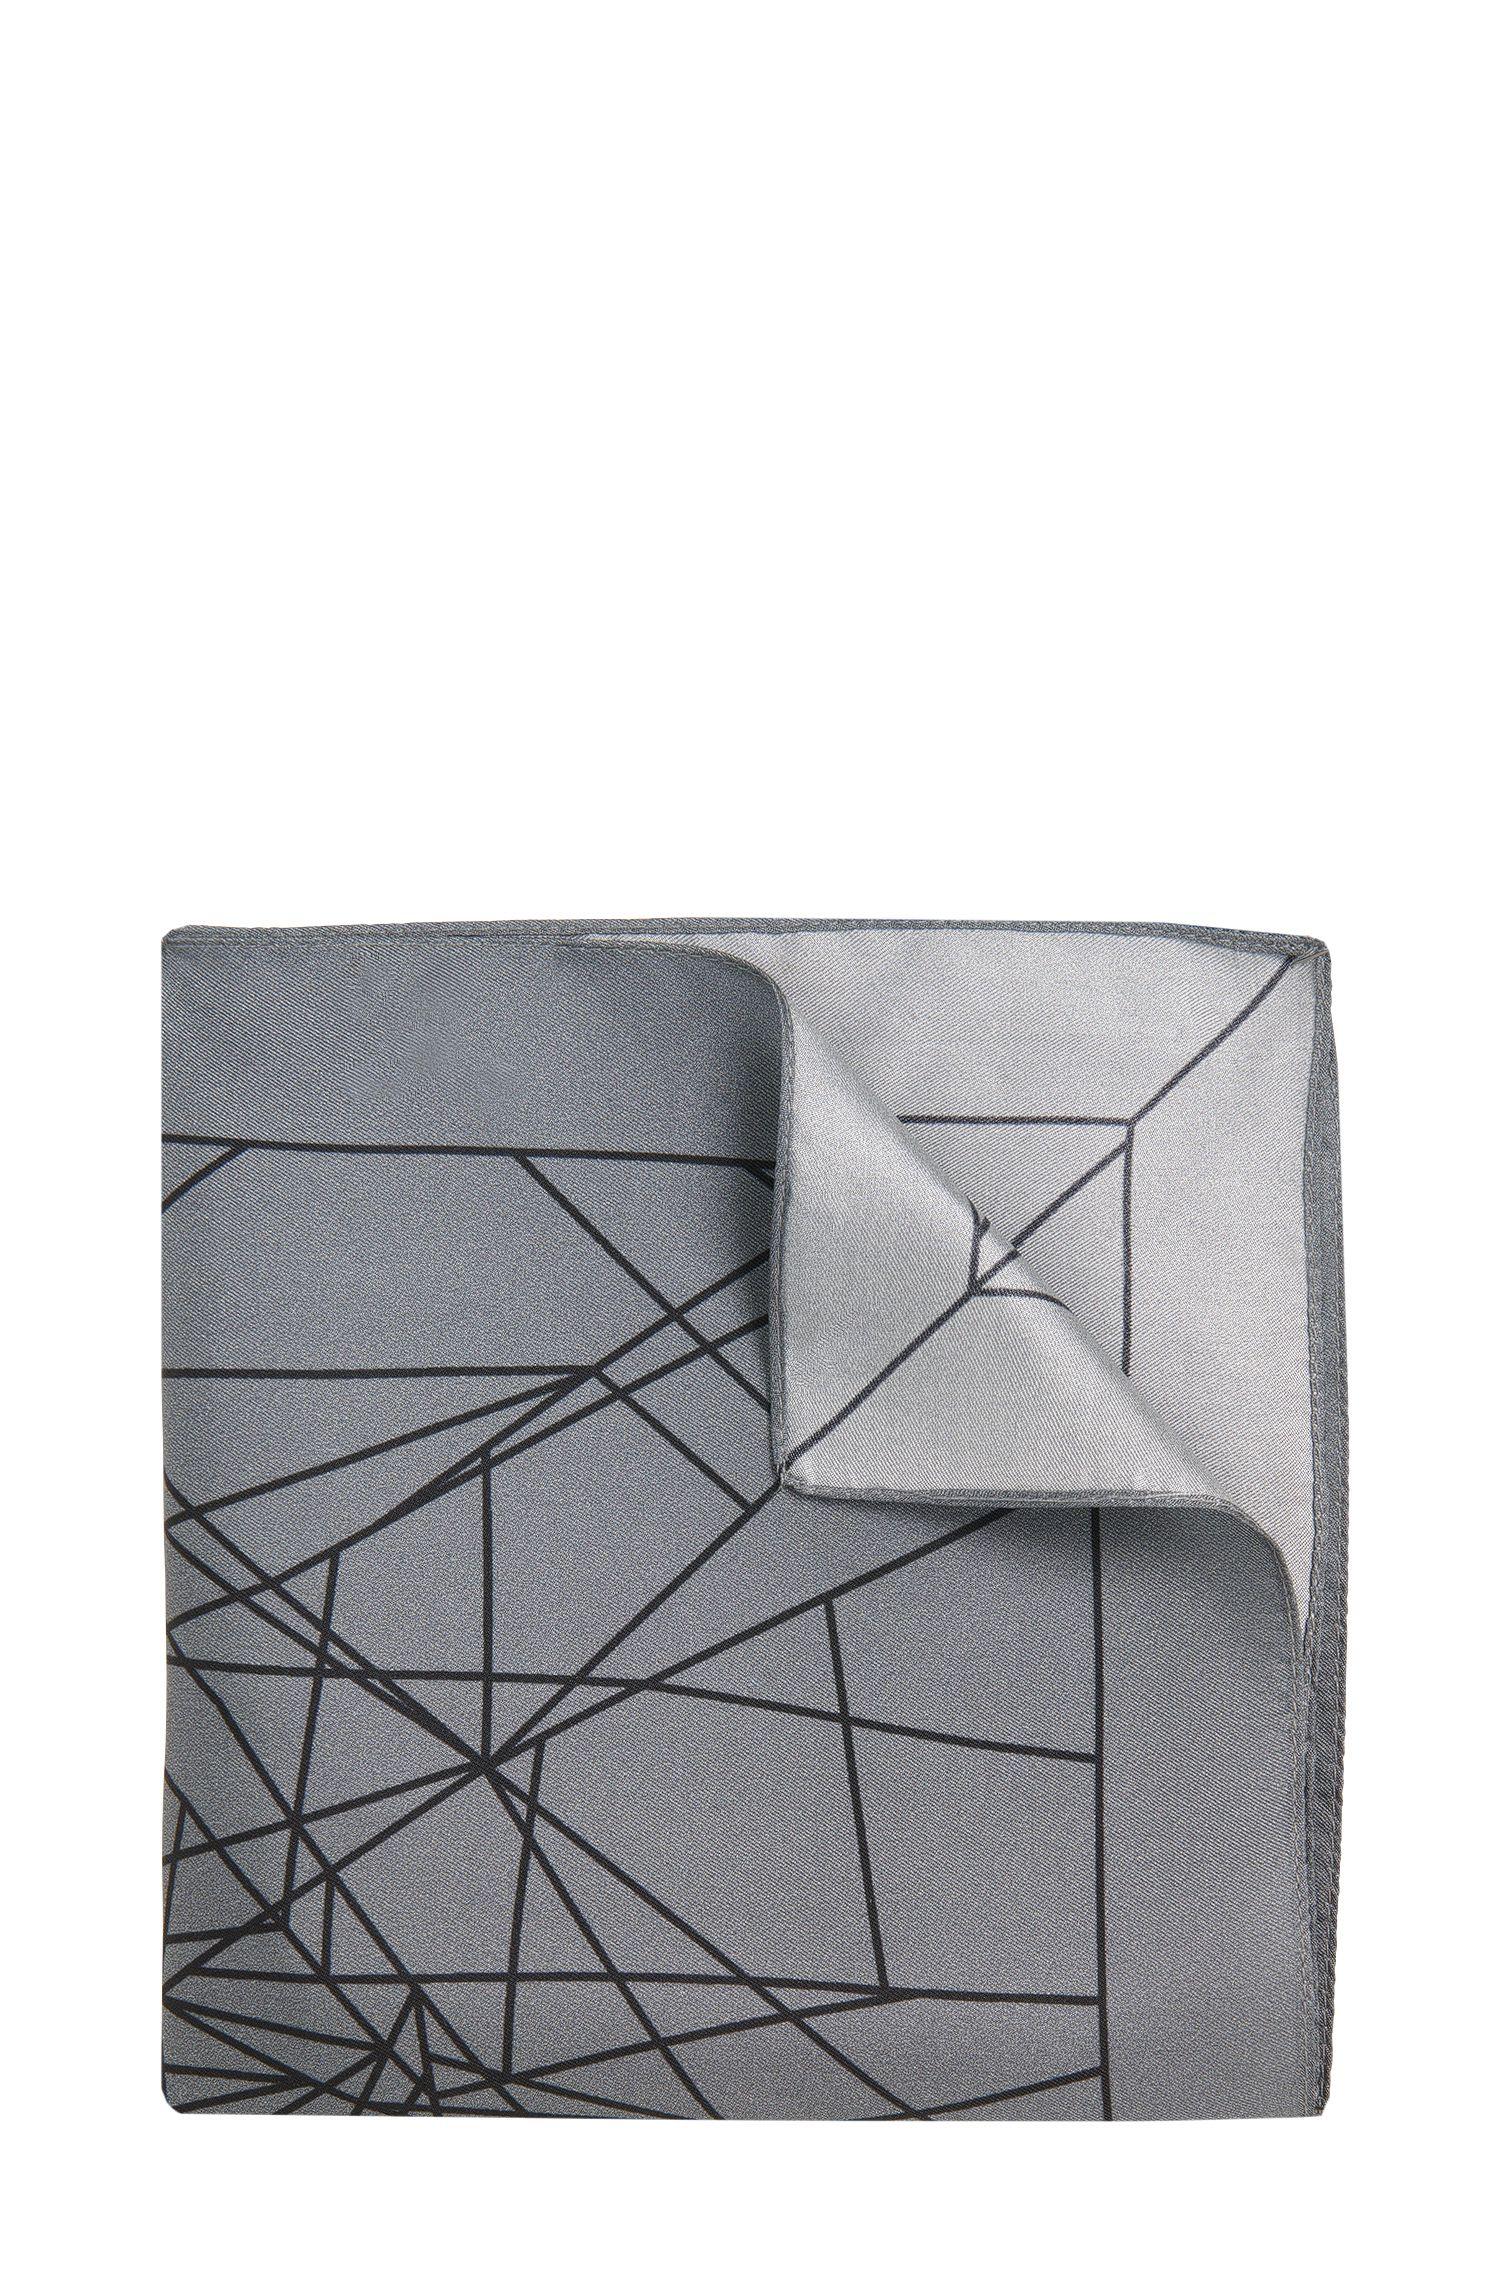 Pañuelo de bolsillo de seda con estampado de líneas: 'Pocket sq. 33x33 cm'